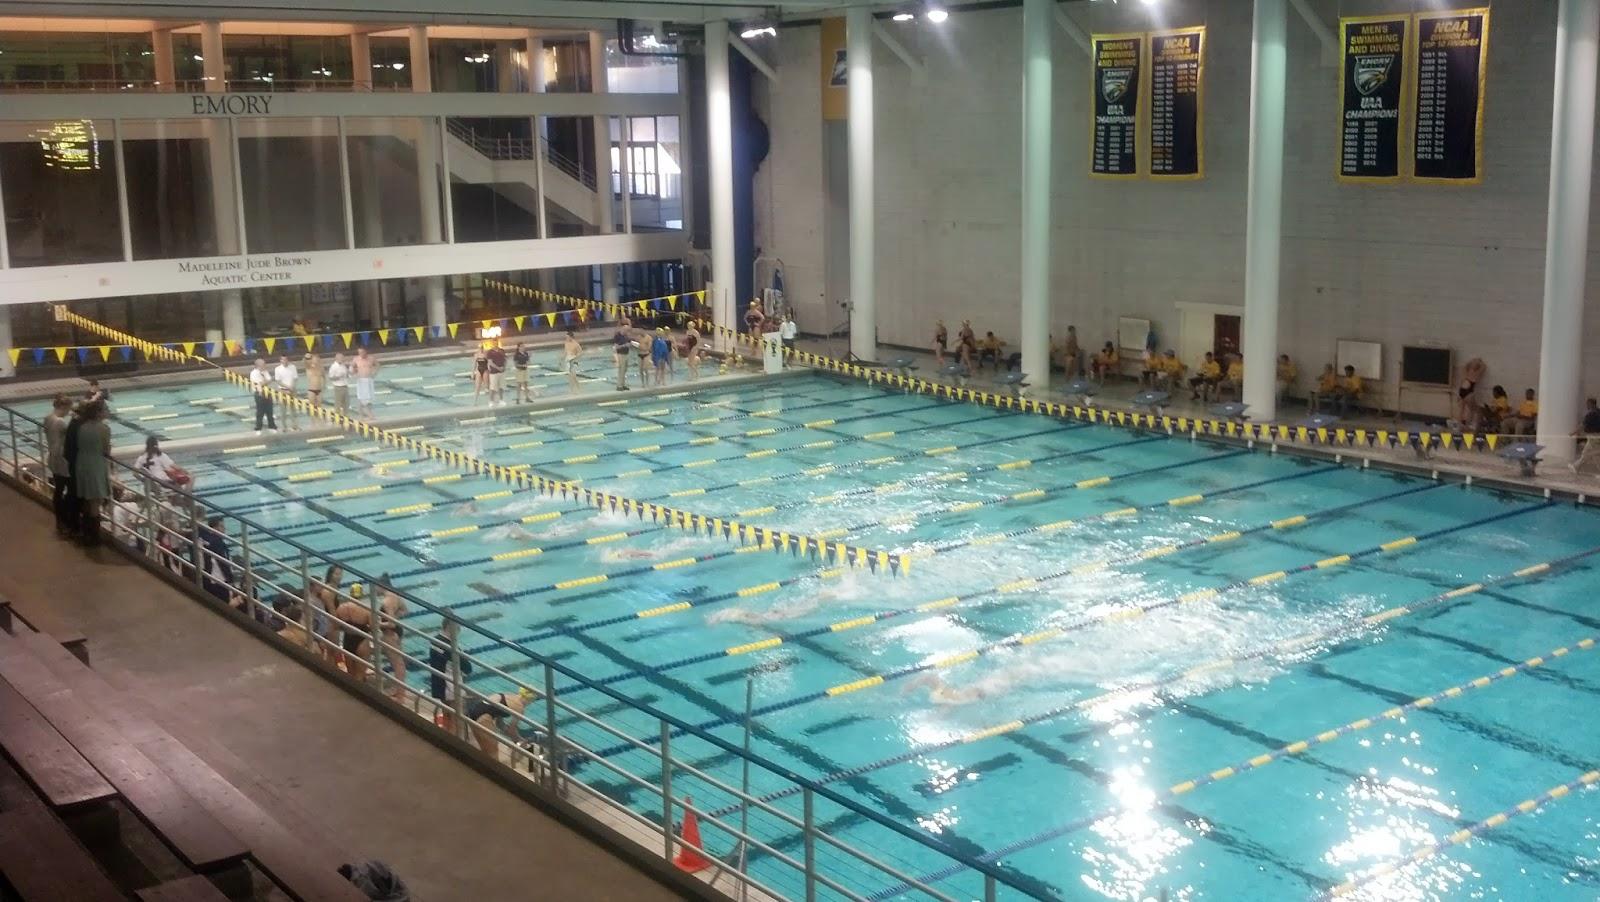 140 emory university brown aquatic center atlanta ga scolin 39 s sports venues visited